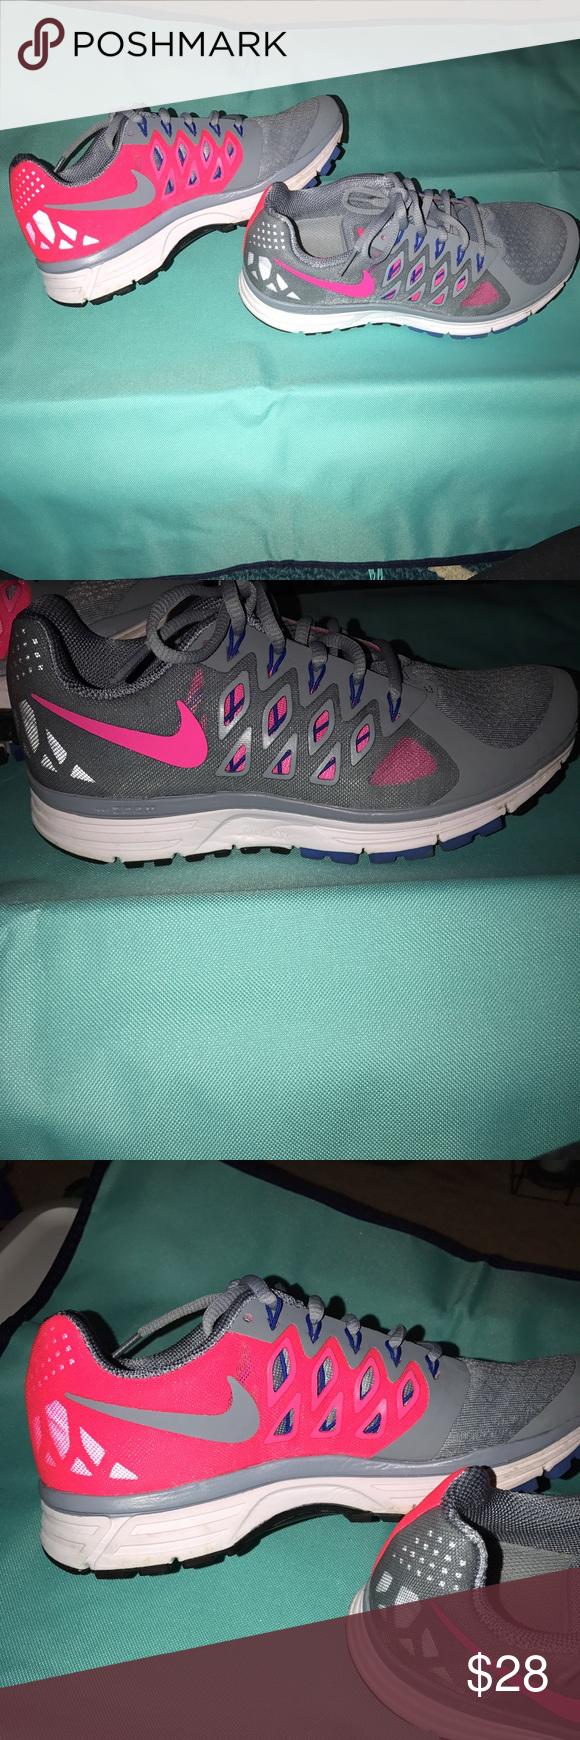 Nike Zoom Vomero Like new 6f4f326be143a